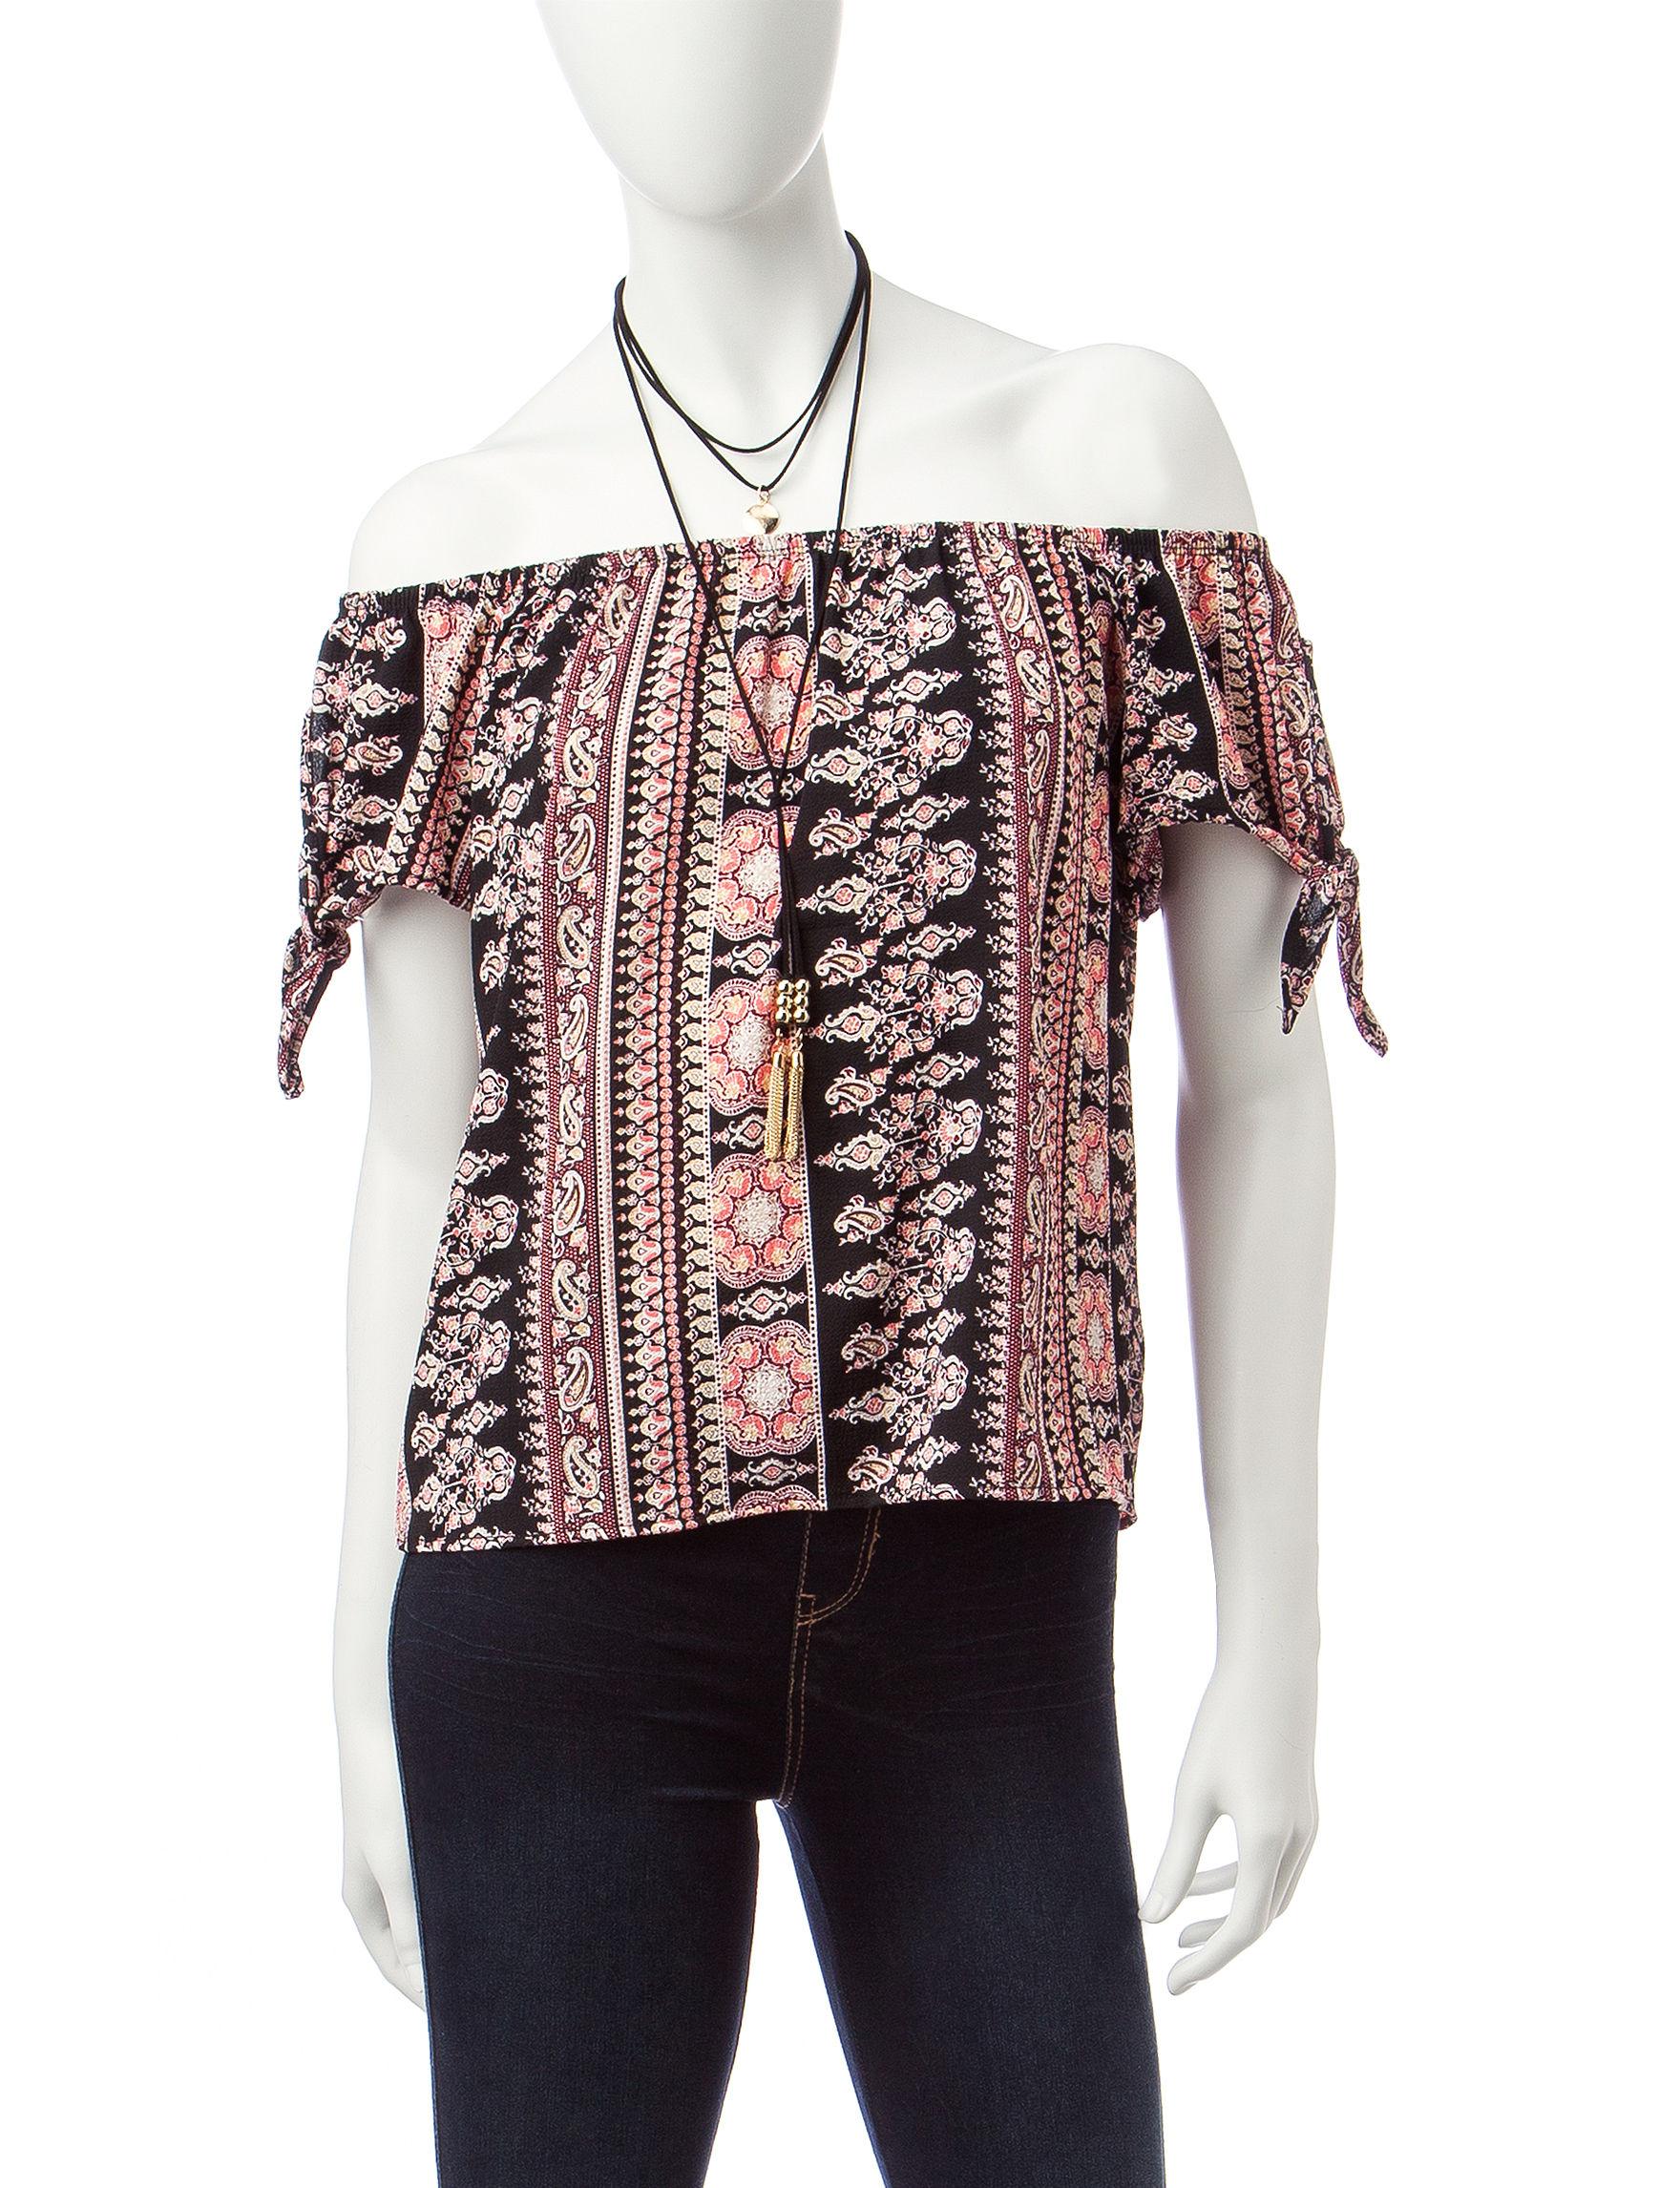 Wishful Park Pink / Black Shirts & Blouses